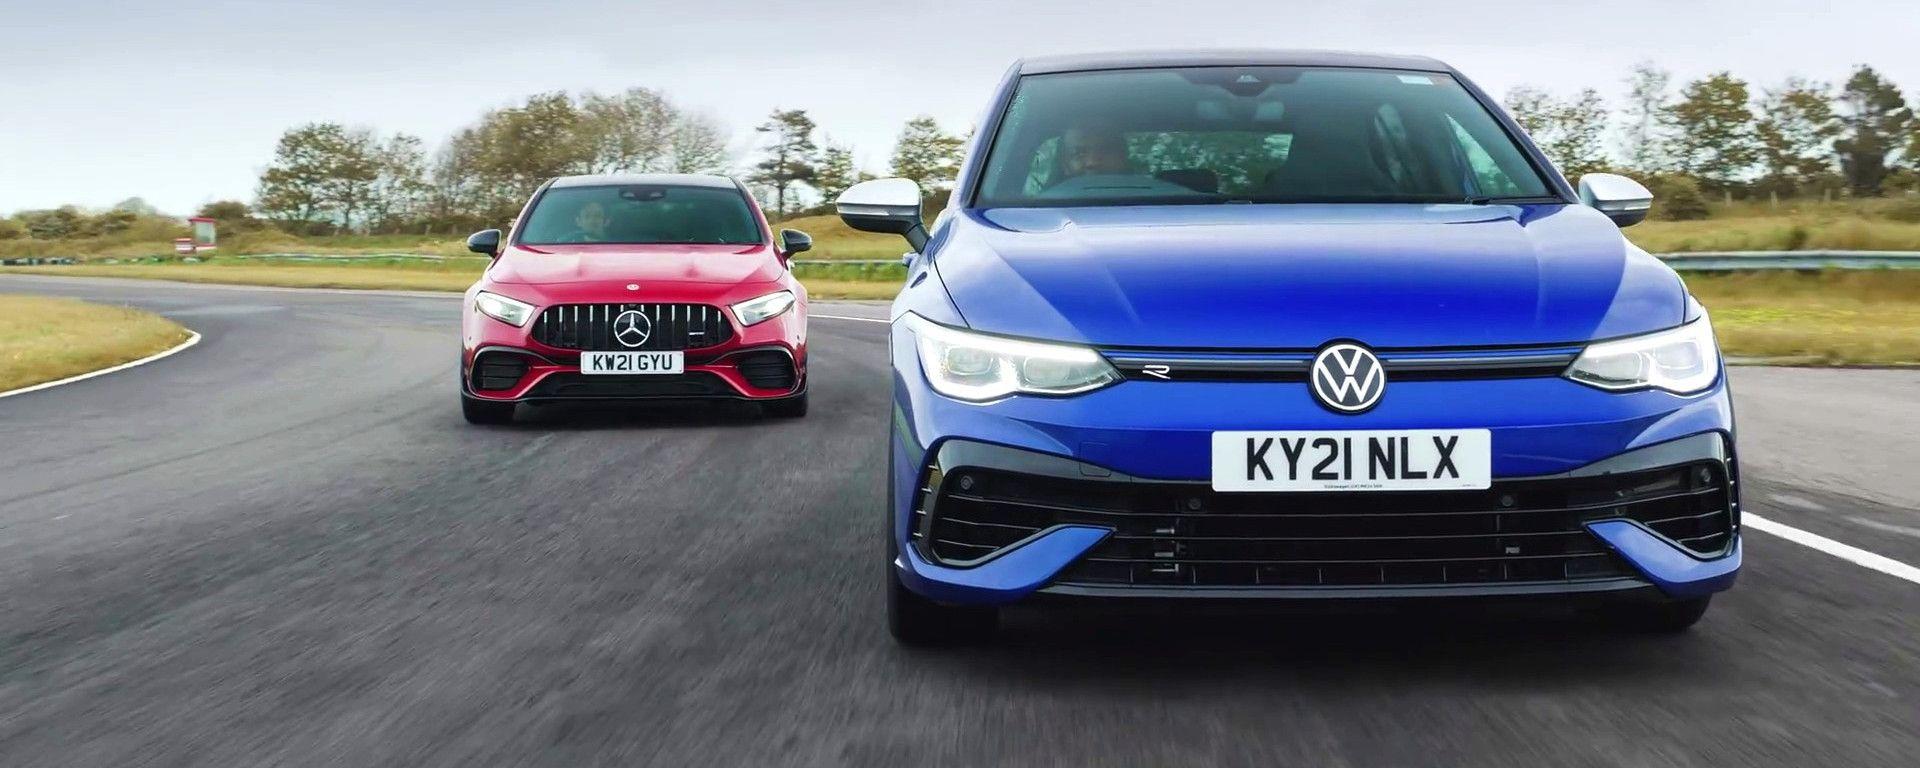 Volkswagen Golf R vs Mercedes-AMG A45 S